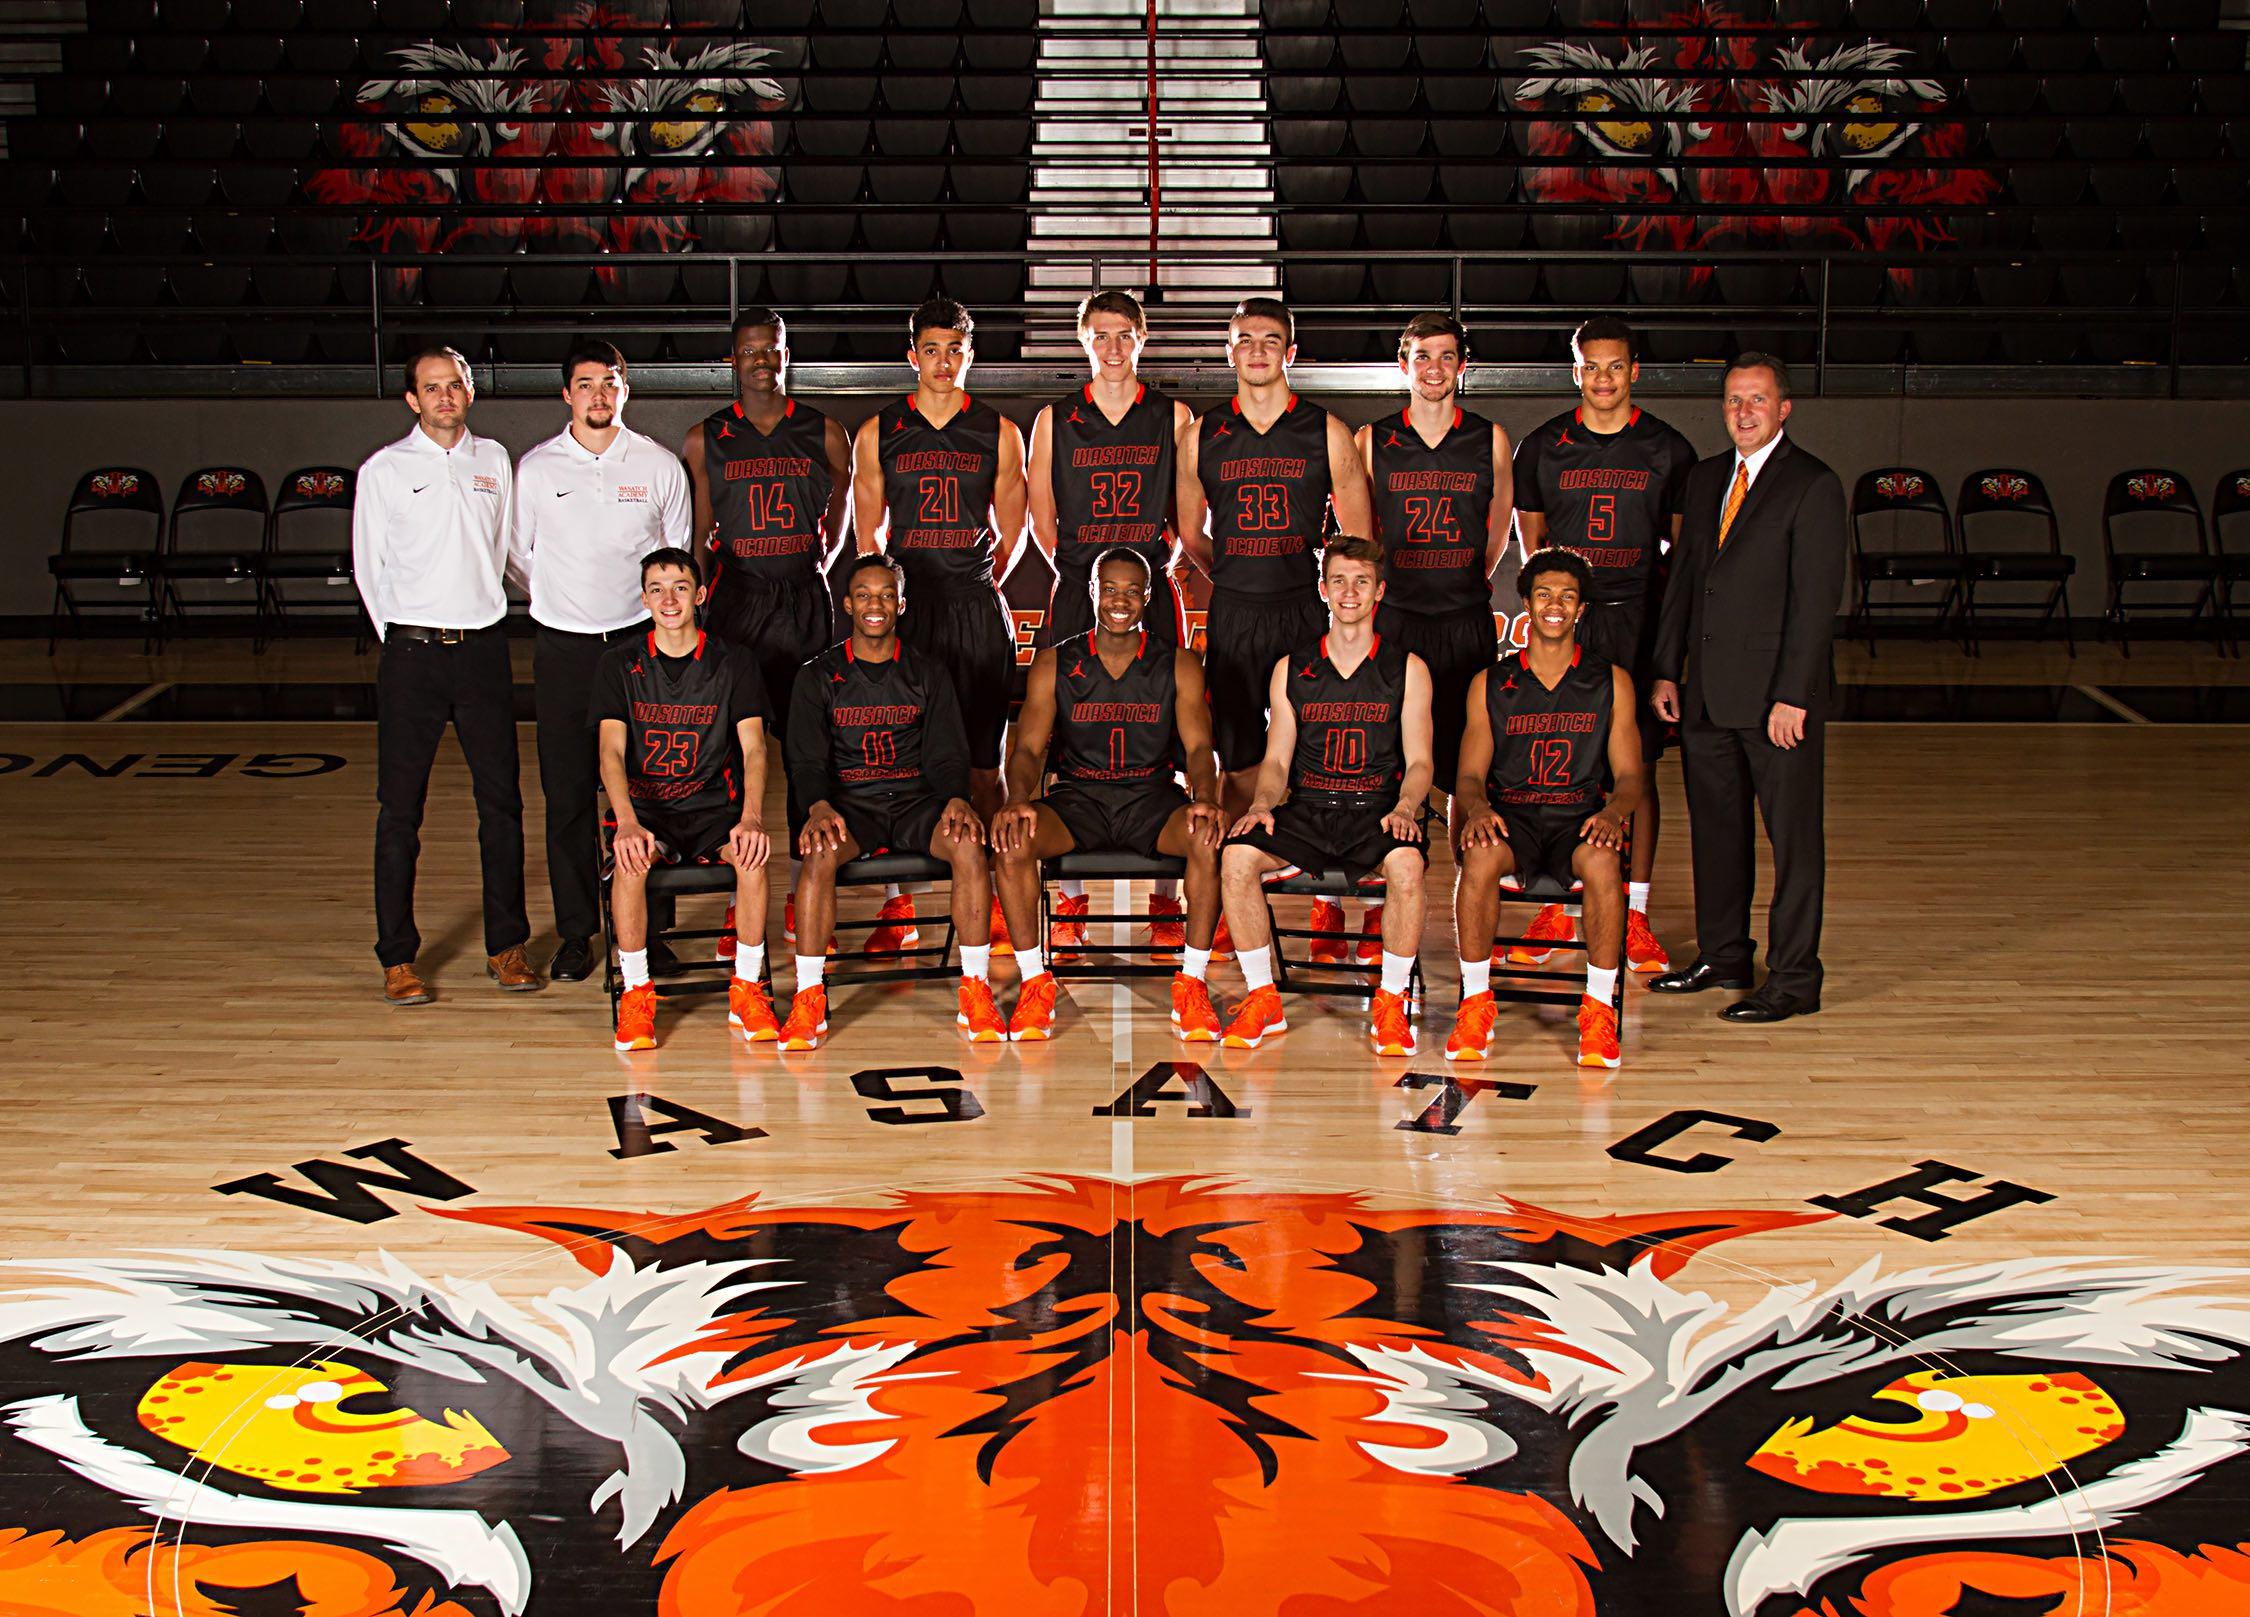 Wasatch Academy (Photo: Wasatch Academy Basketball)